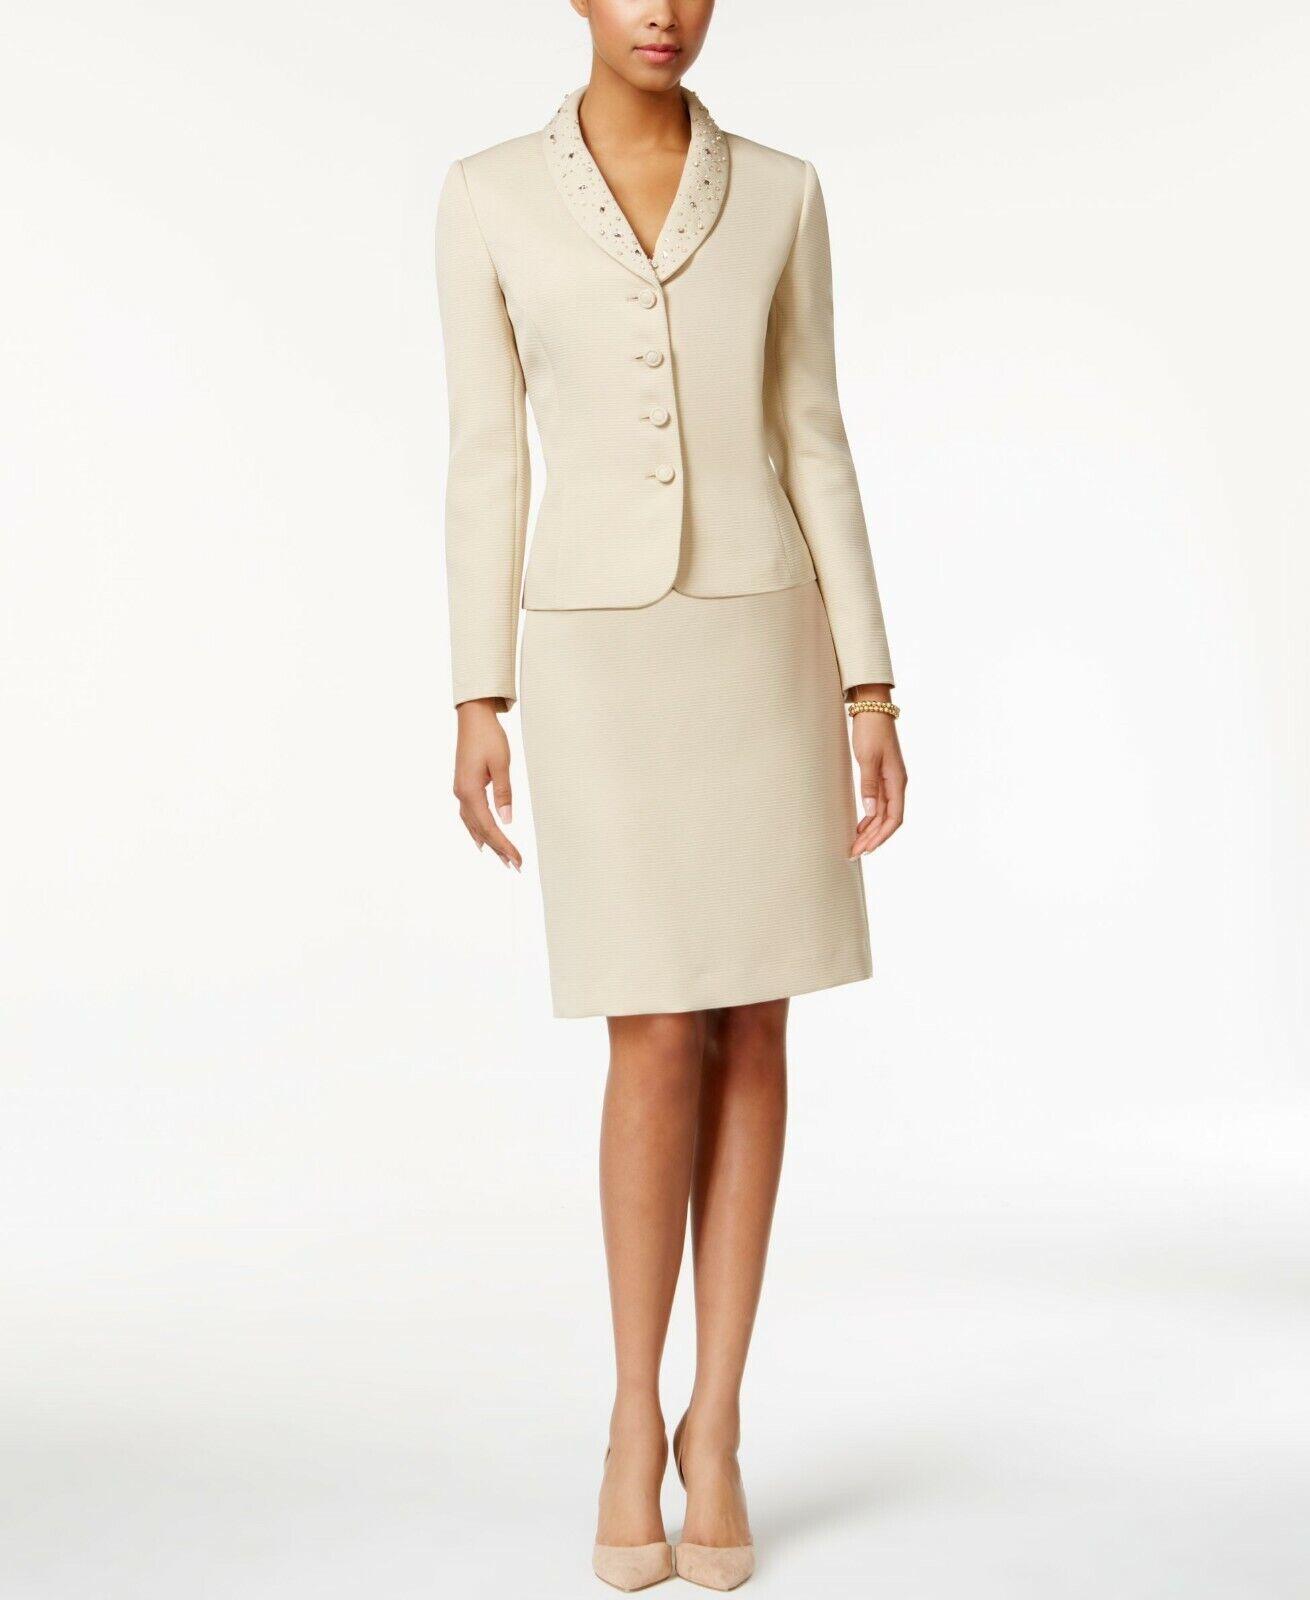 NWT Tahari ASL Bead - Trim Texturöd kjol Suit, Storlek 10P